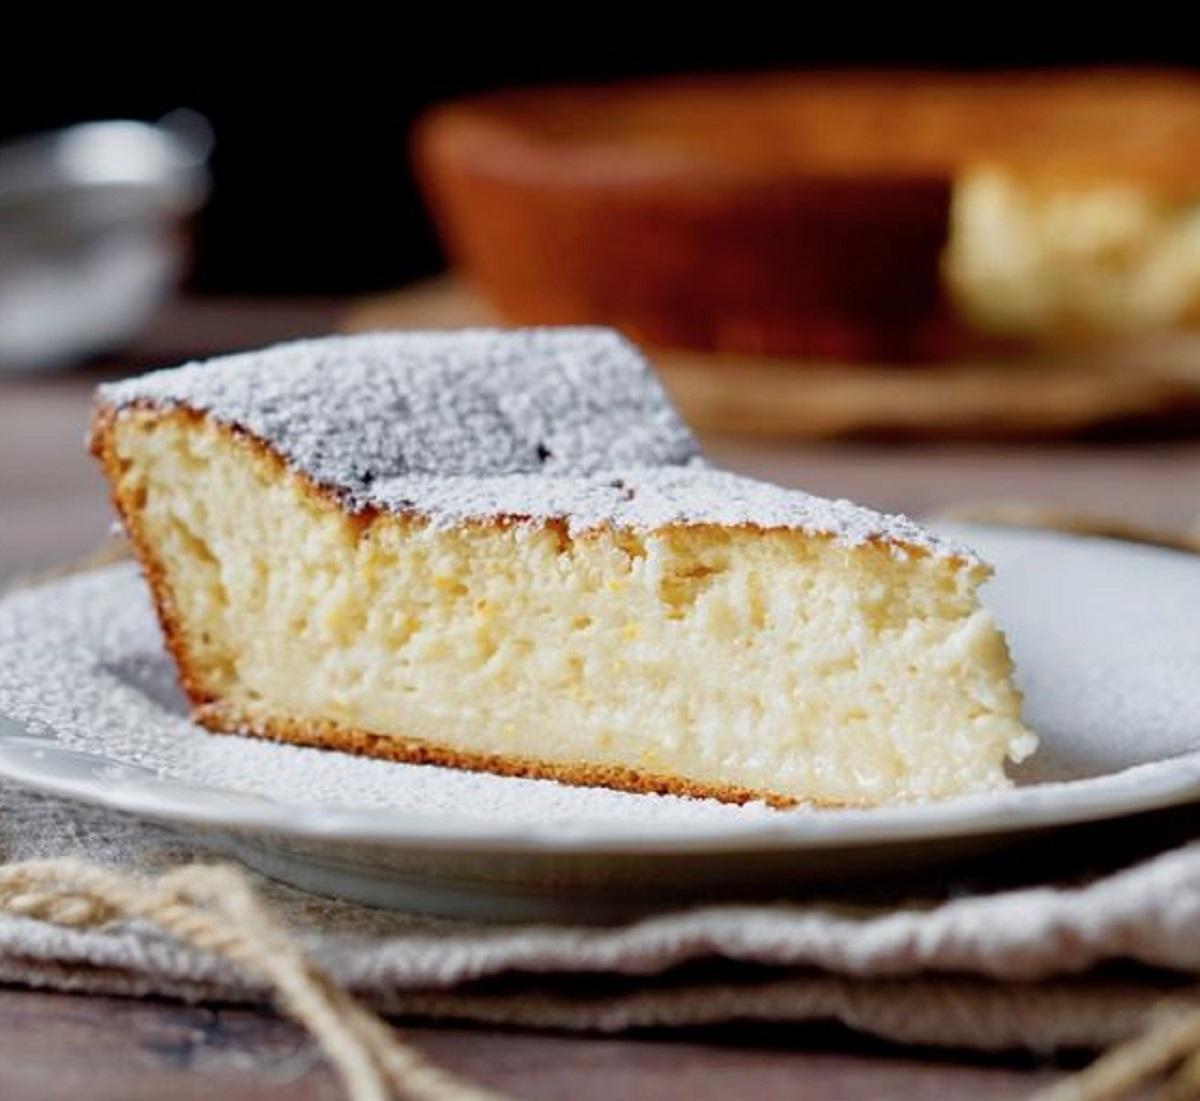 Ricette Veloci Yogurt Greco.Torta Allo Yogurt Greco Senza Uova E Burro Ricetta Light Food Blog